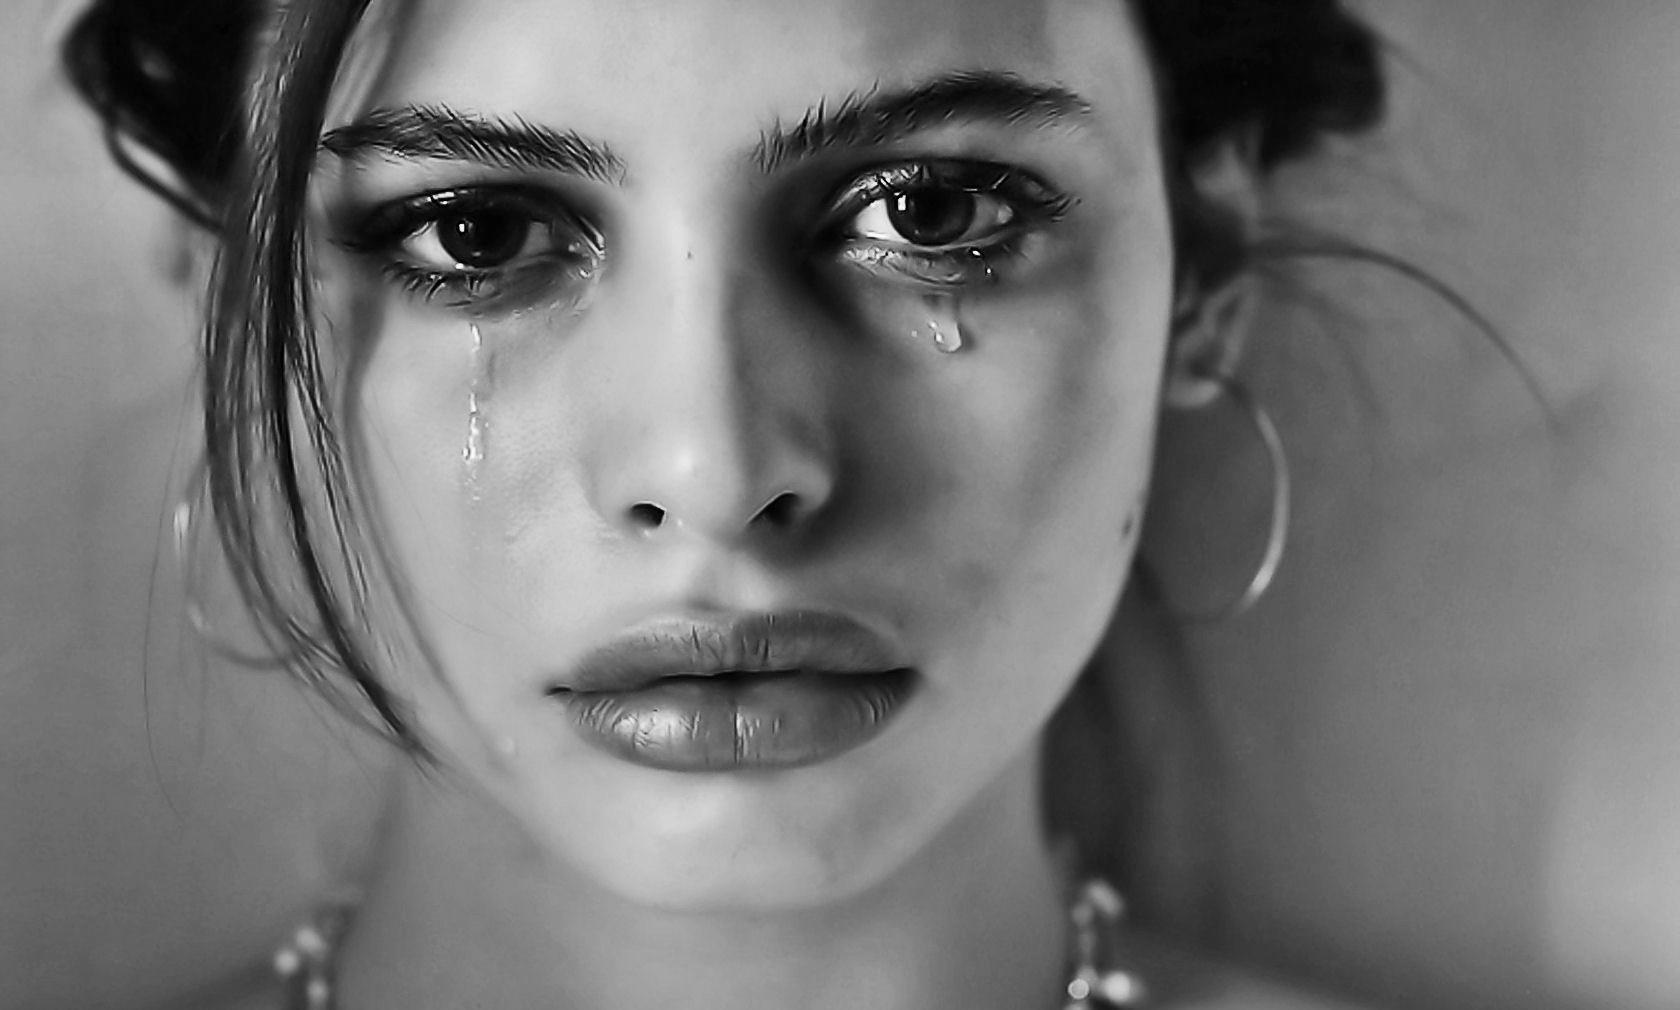 Картинка с плачующей девушкой